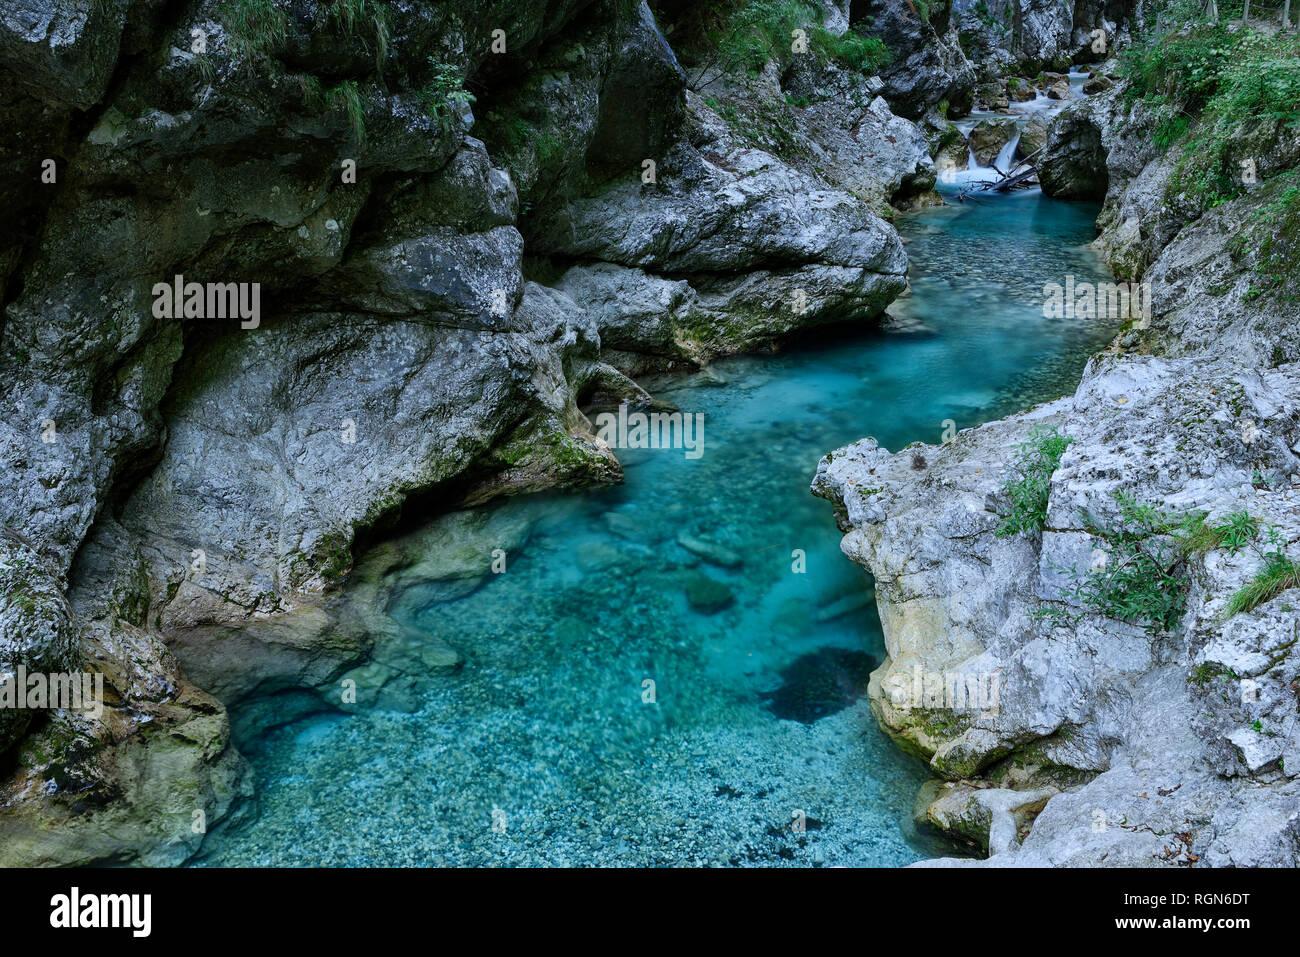 Eslovenia, Tolmin, el Parque Nacional de Triglav, Tolmin Gargantas Foto de stock